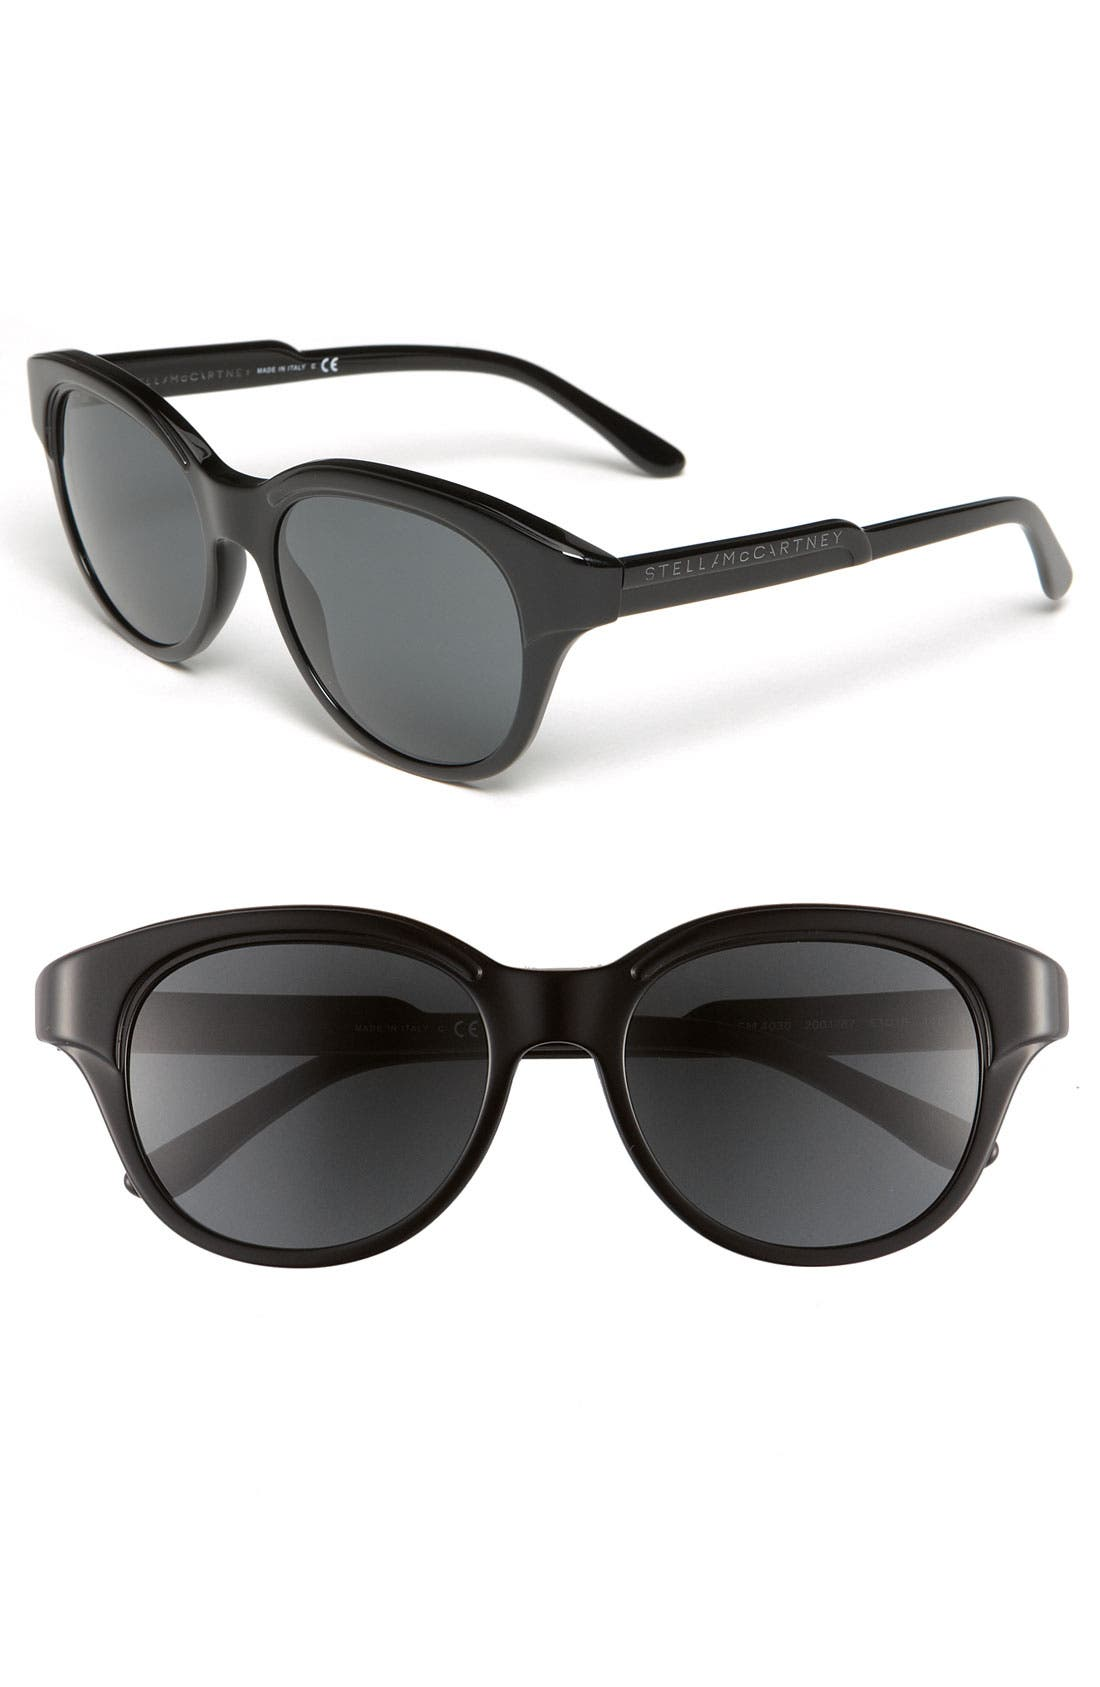 Alternate Image 1 Selected - Stella McCartney 'Small' 53mm Cat's Eye Sunglasses